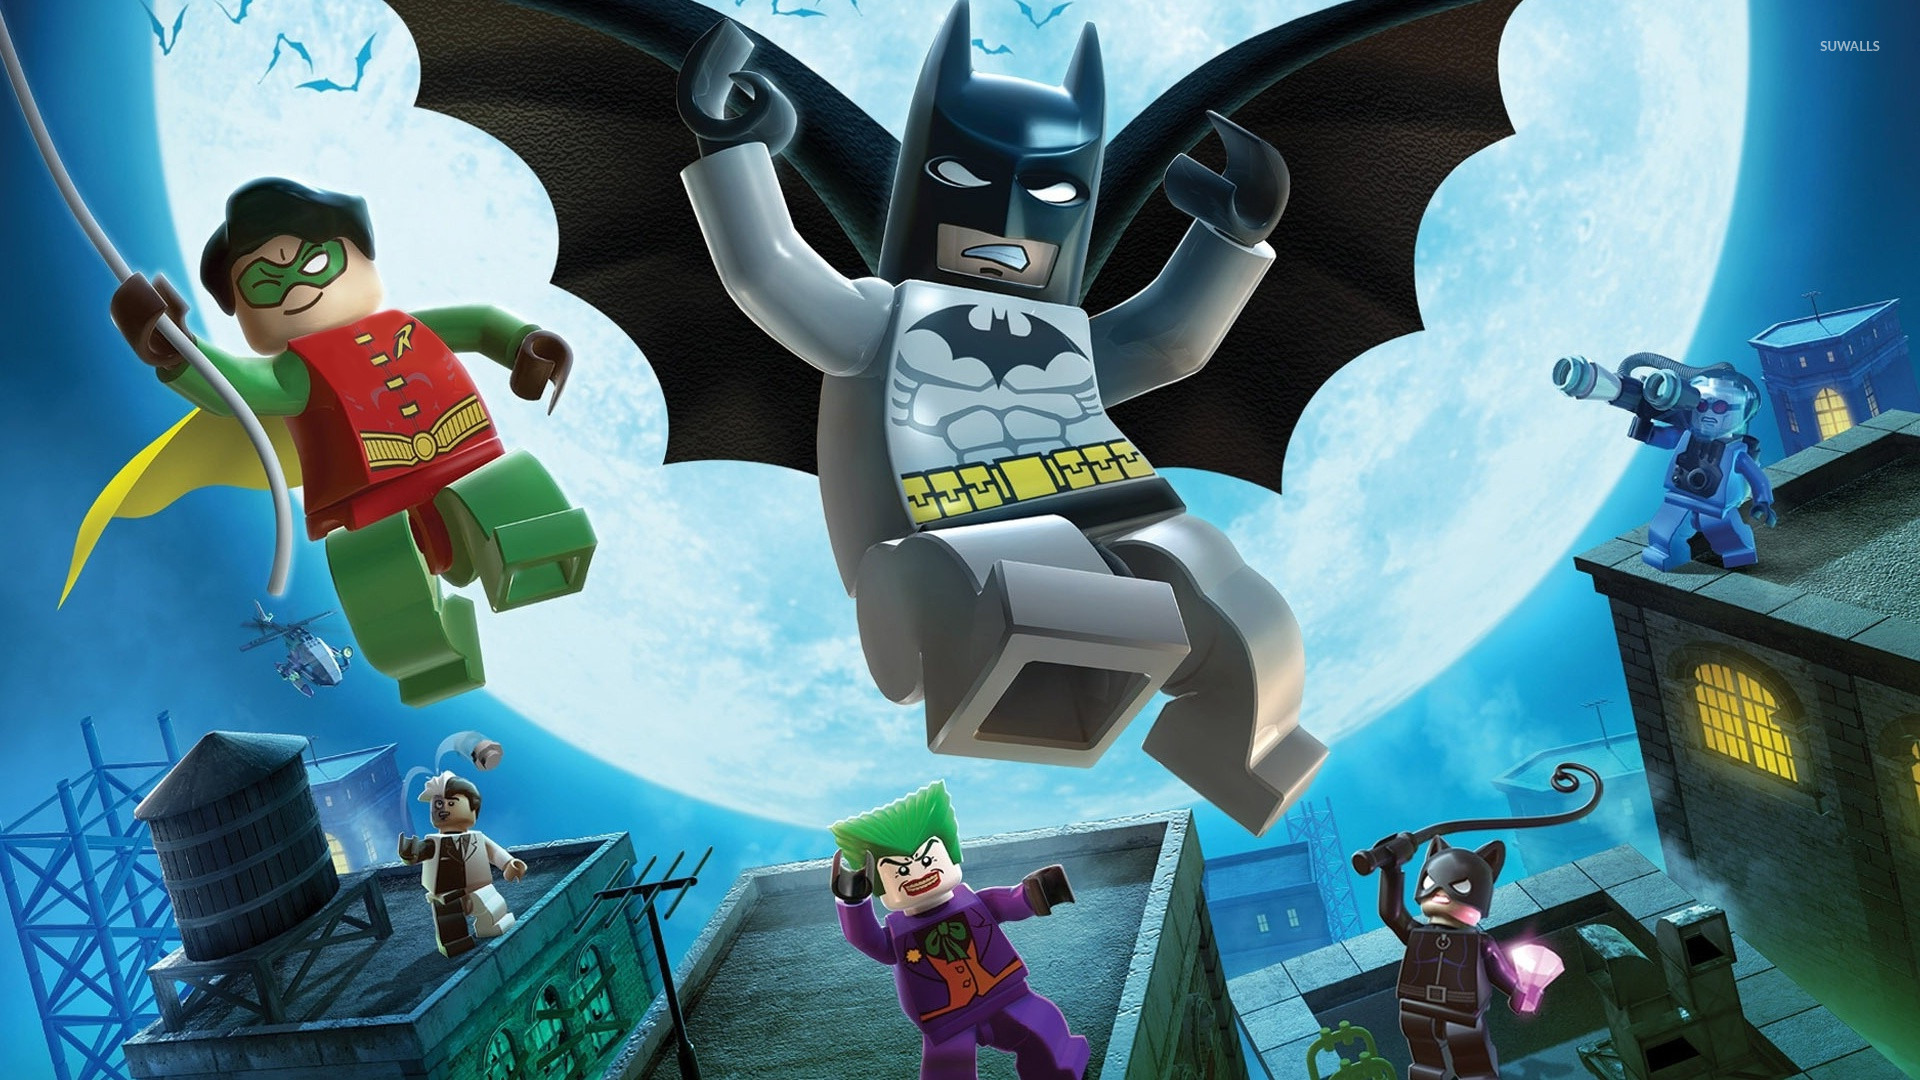 lego batman 2 wallpaper flash - photo #35